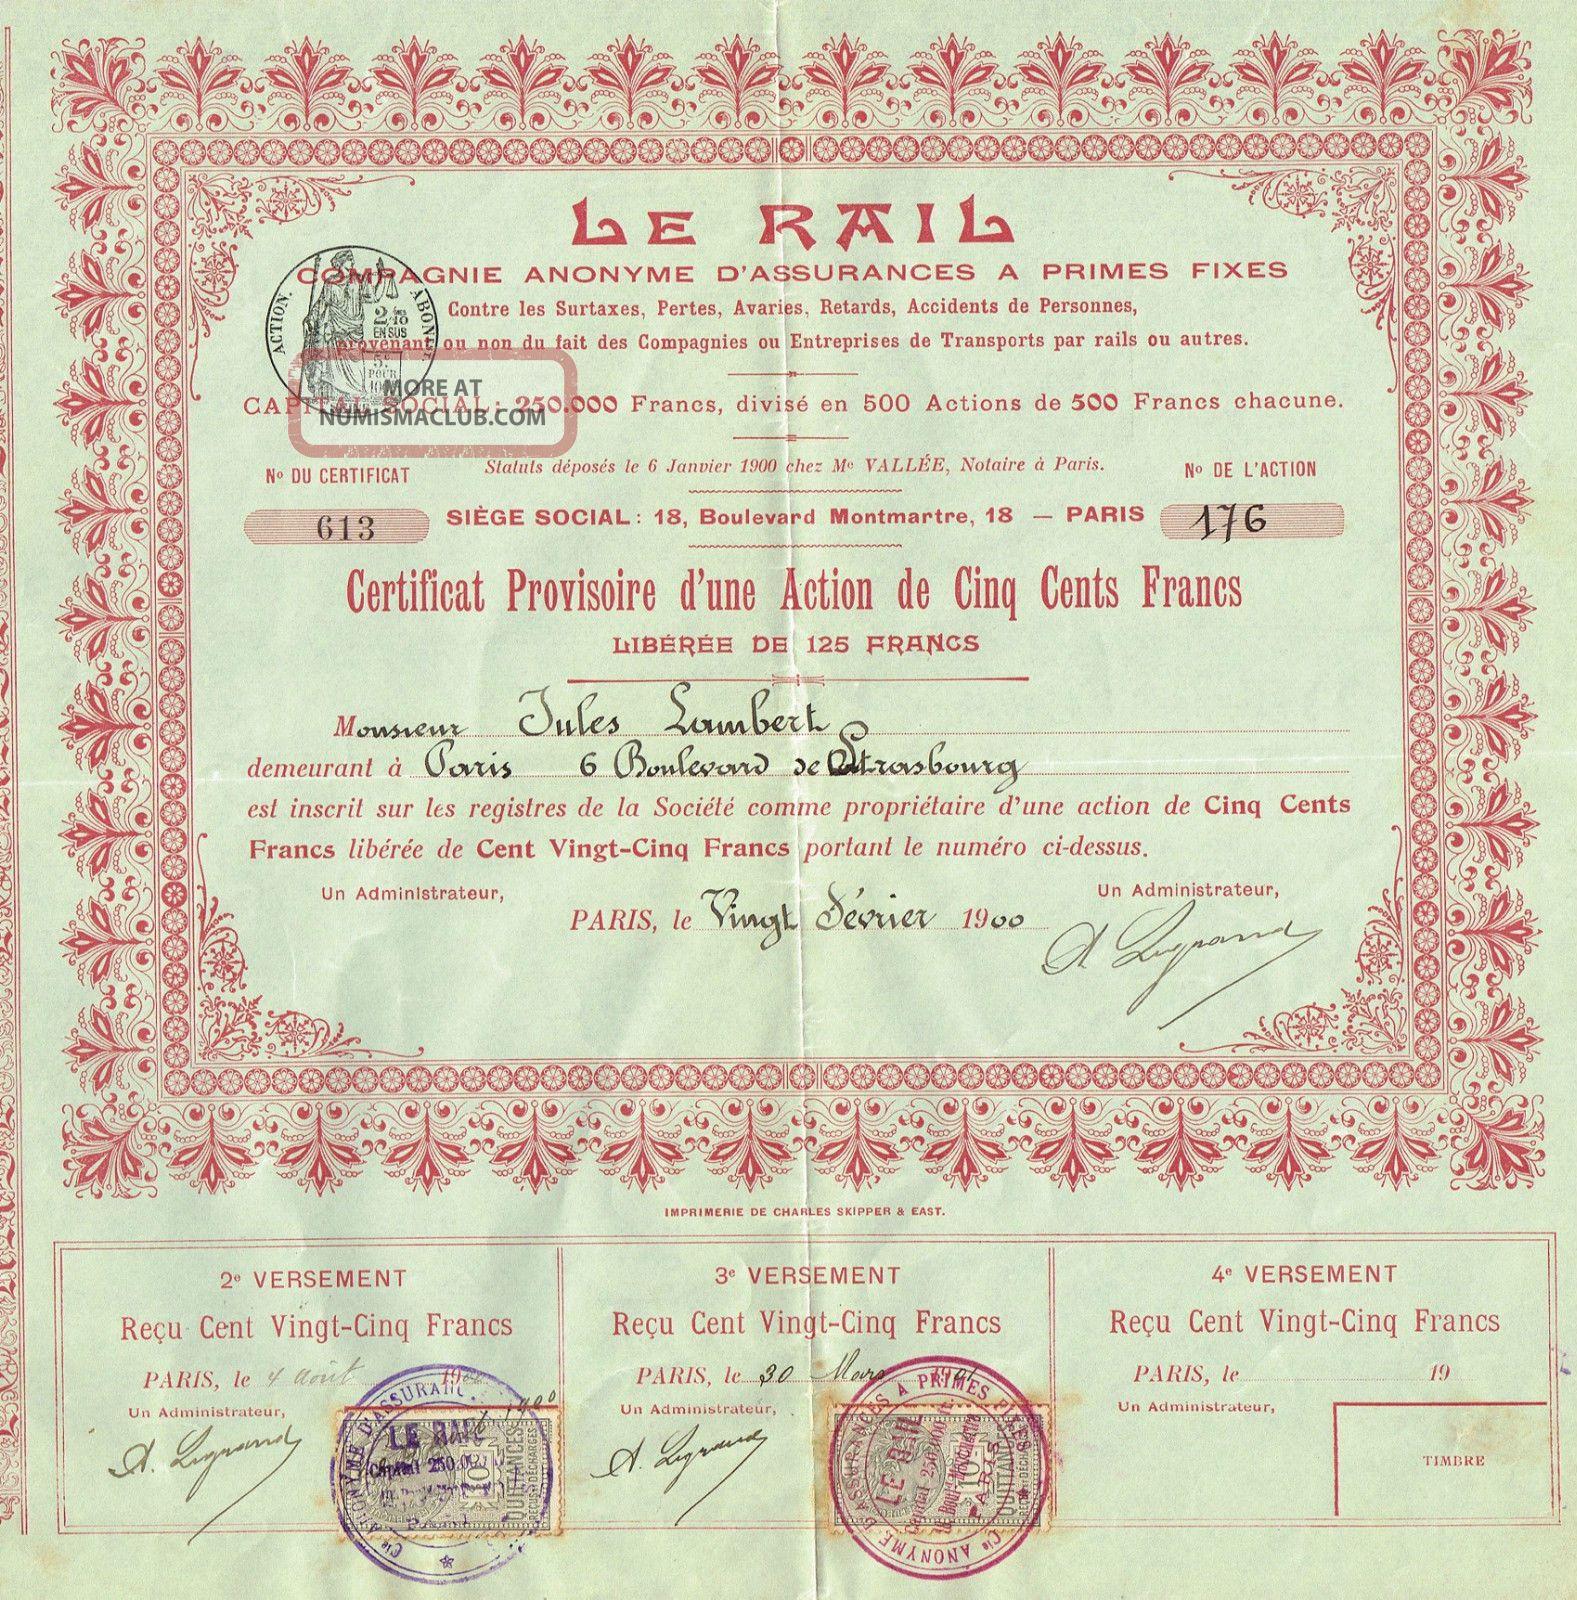 France Liability Insurance Company Stock Certificate 190o Le Rail World photo